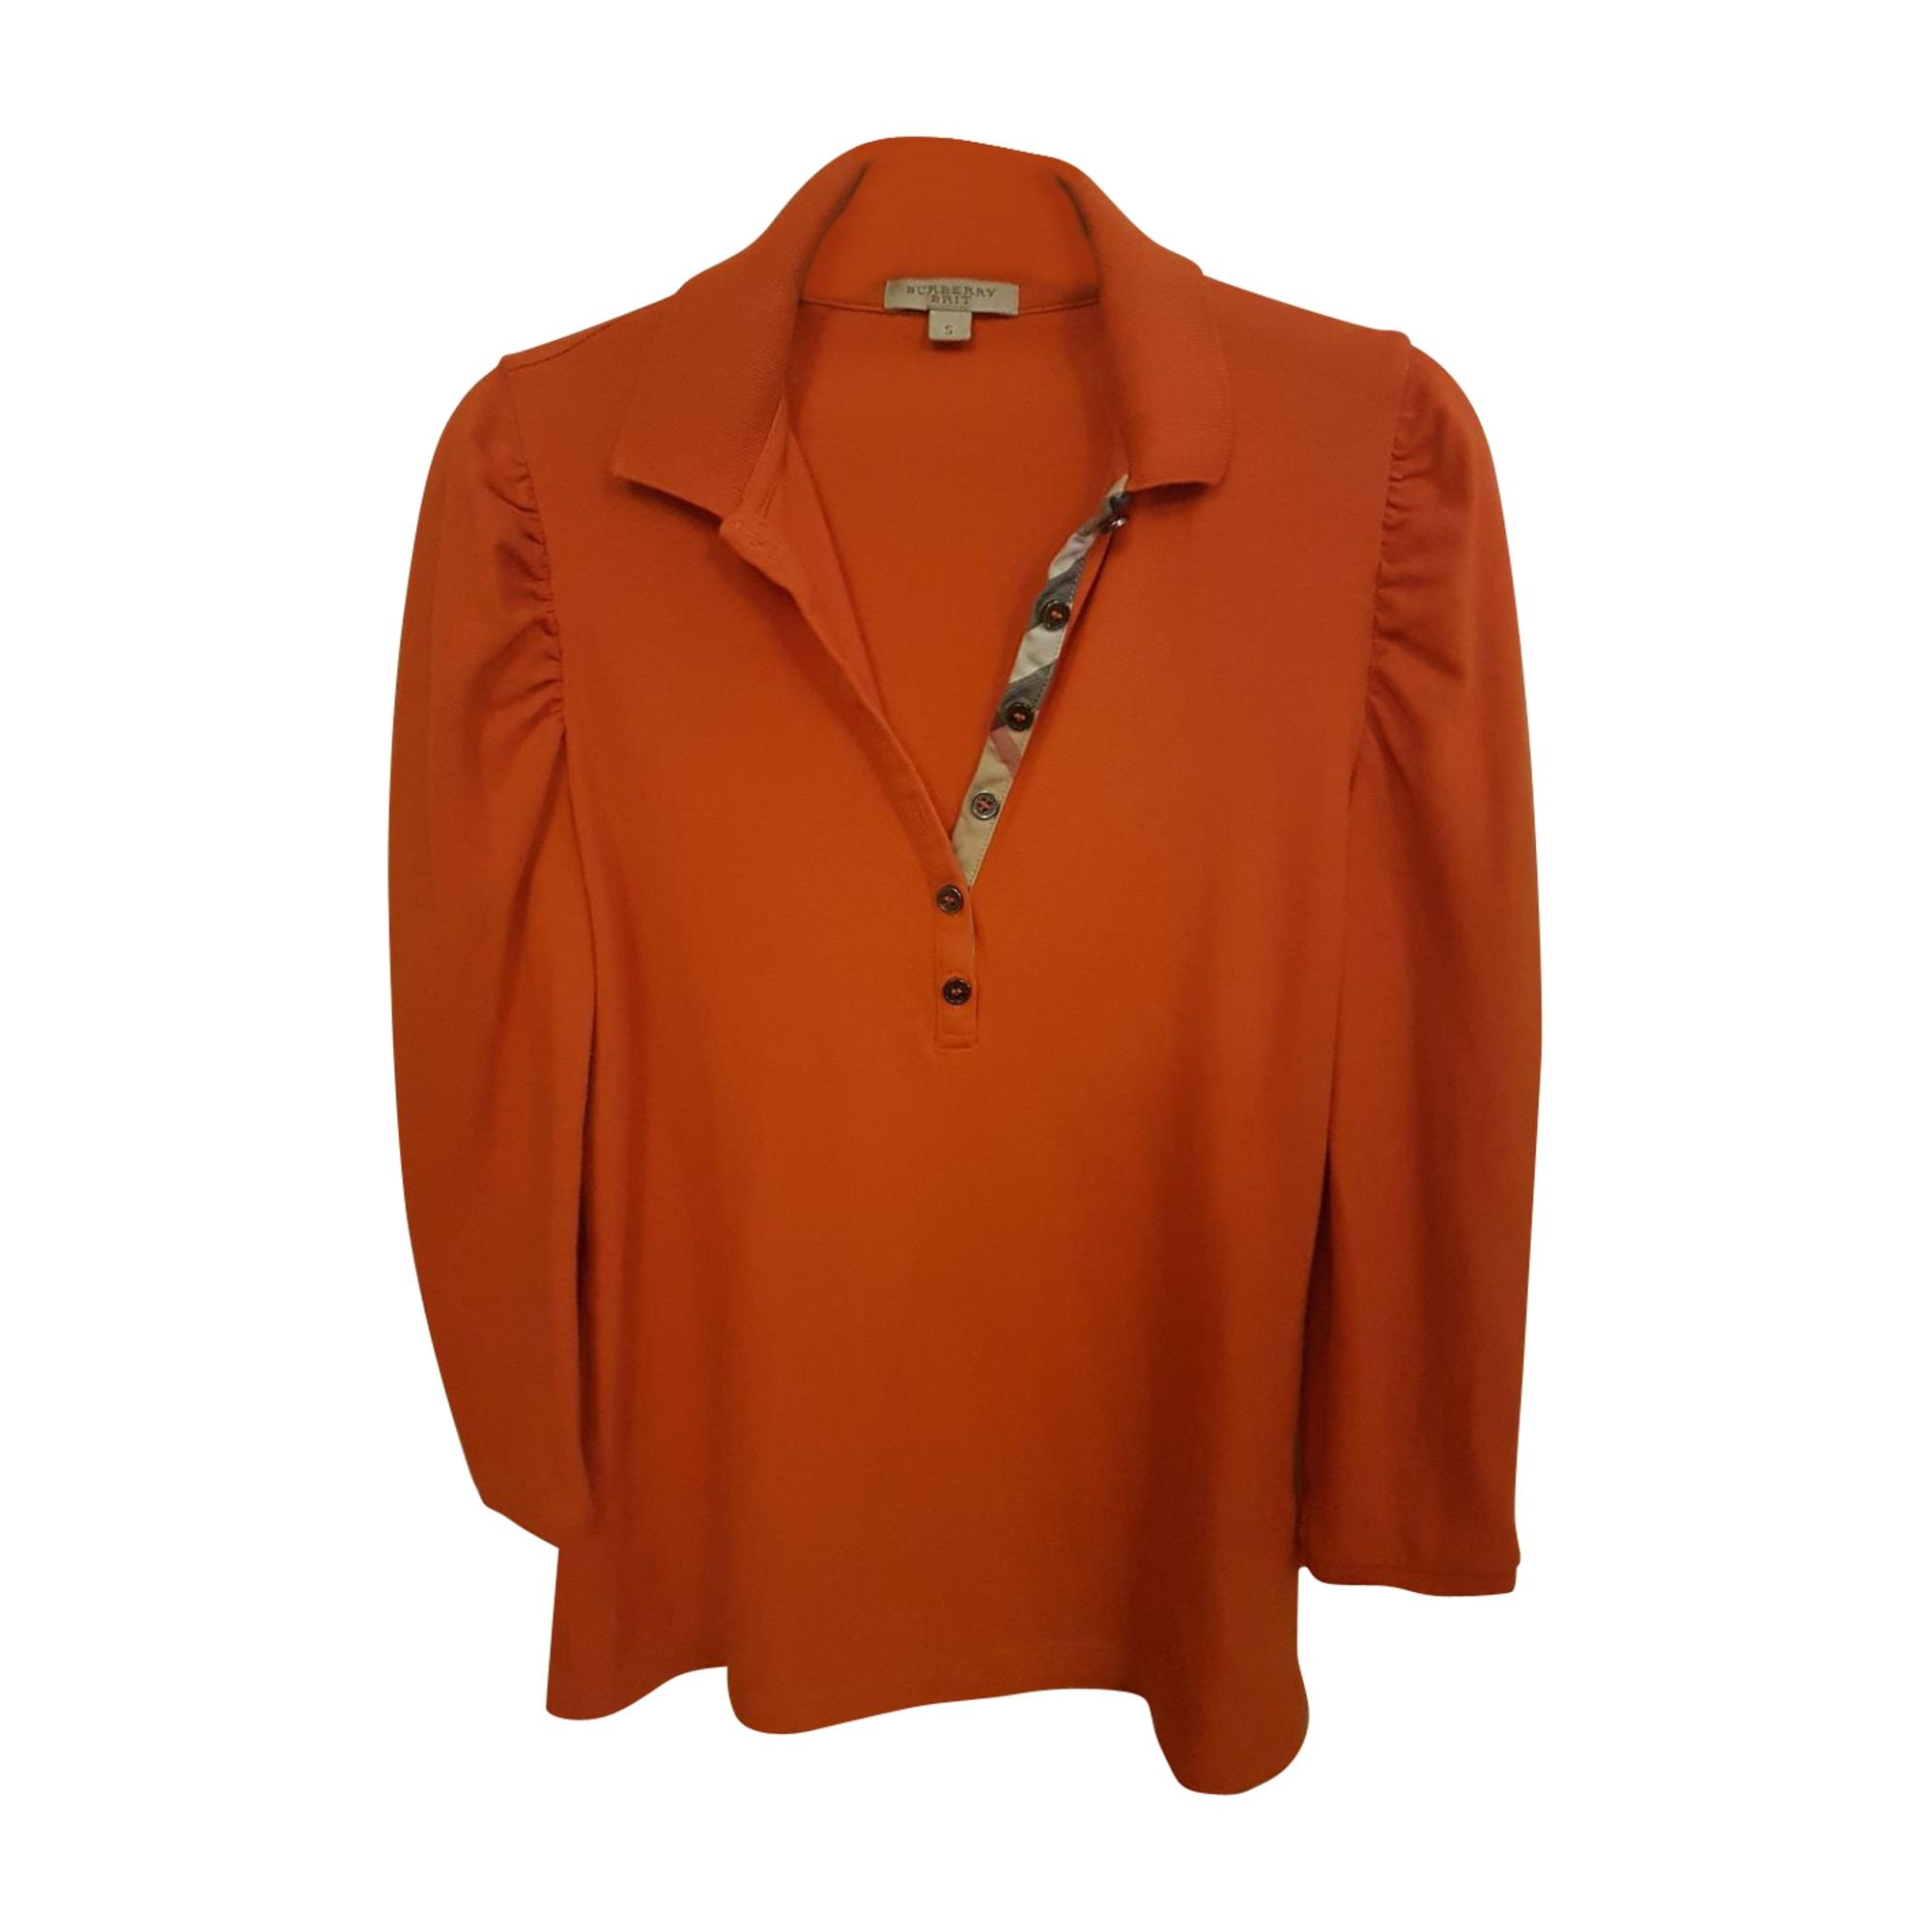 Polo BURBERRY Orange